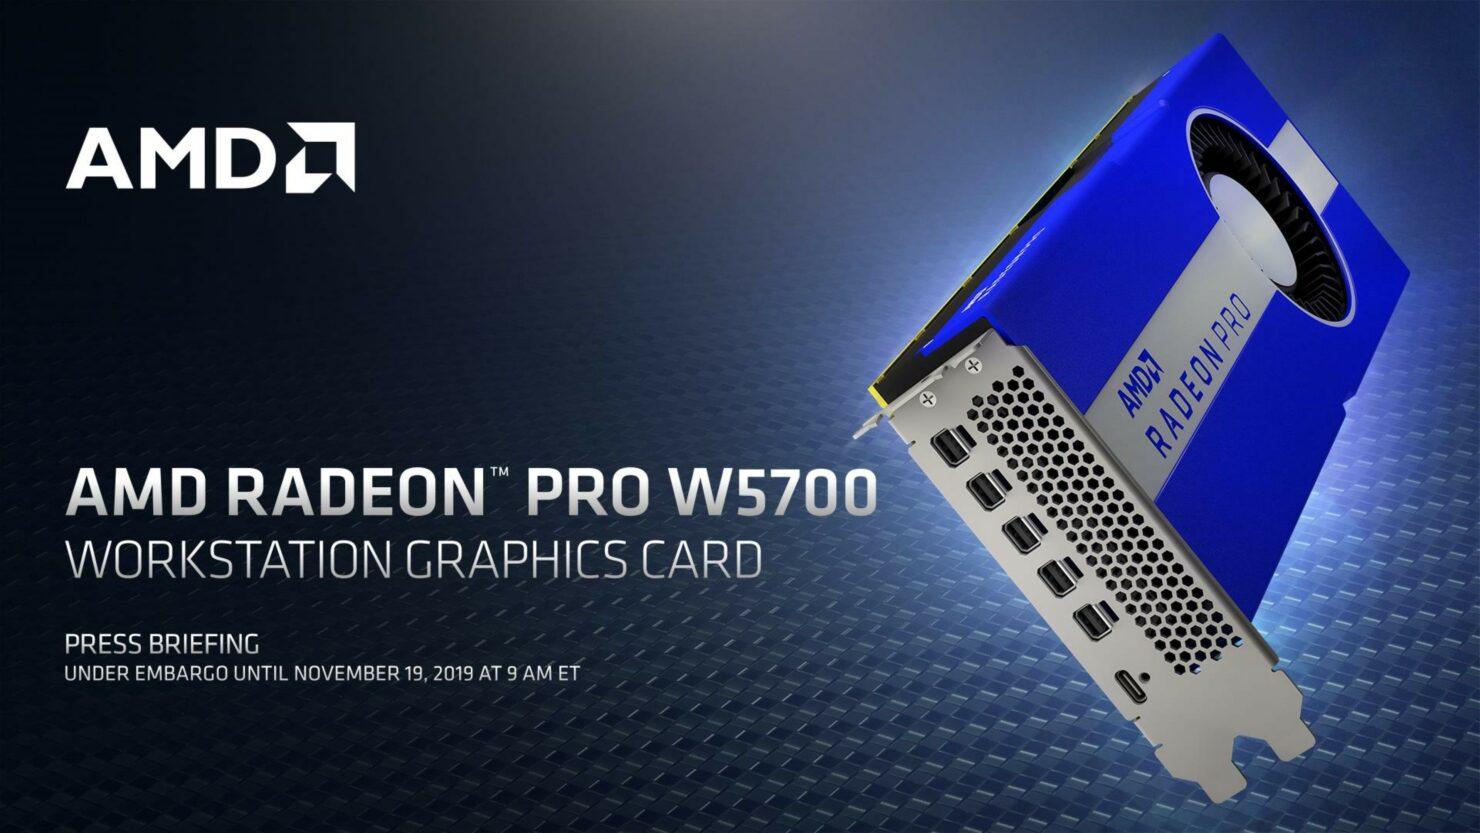 amd-radeon-pro-w5700-workstation-graphics-card_1-custom